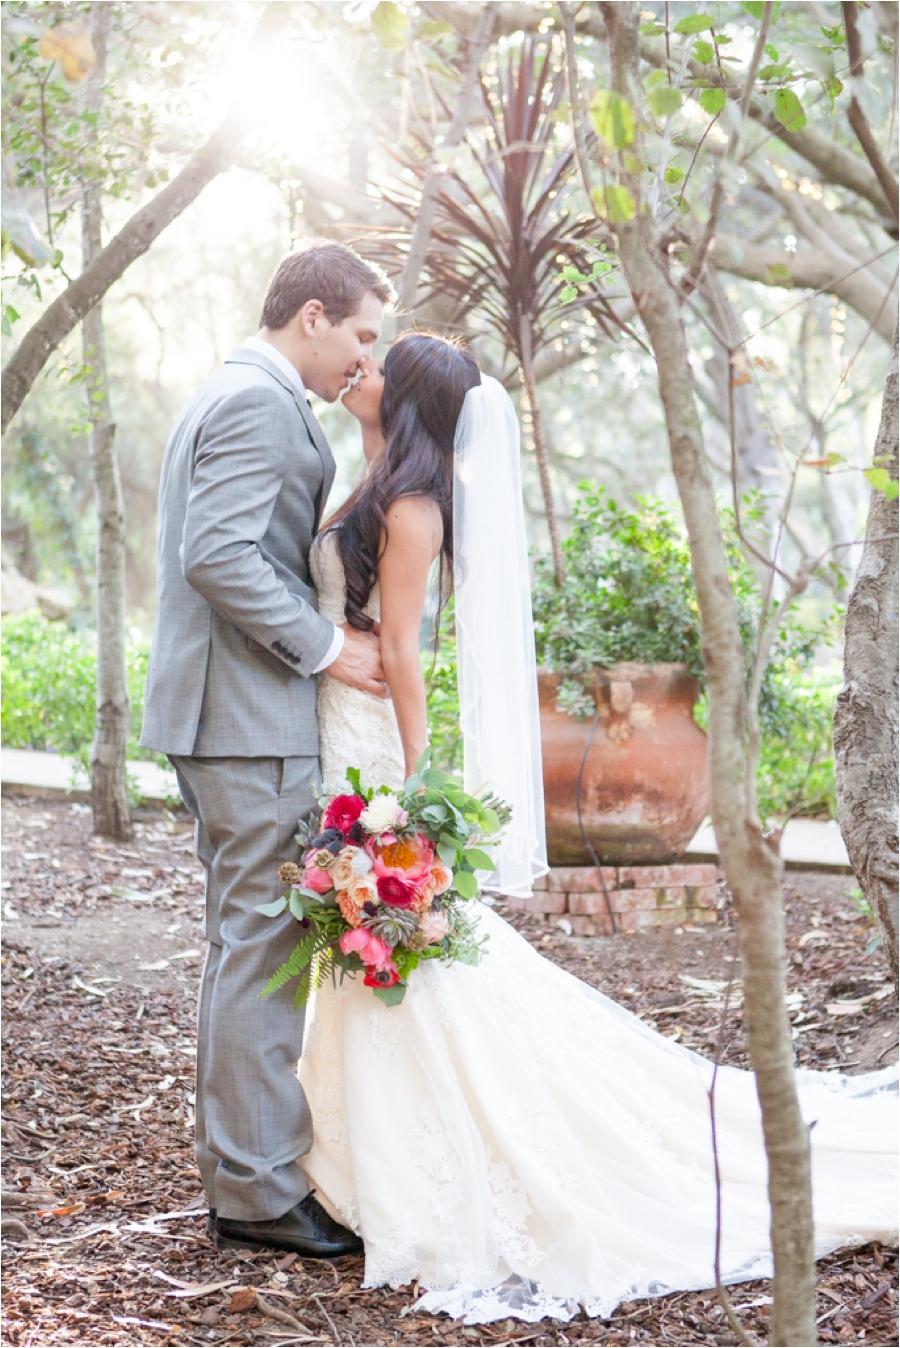 Jasmine and Donny- Calamigos Ranch Wedding ©Shaun and Skyla Walton-293.jpg